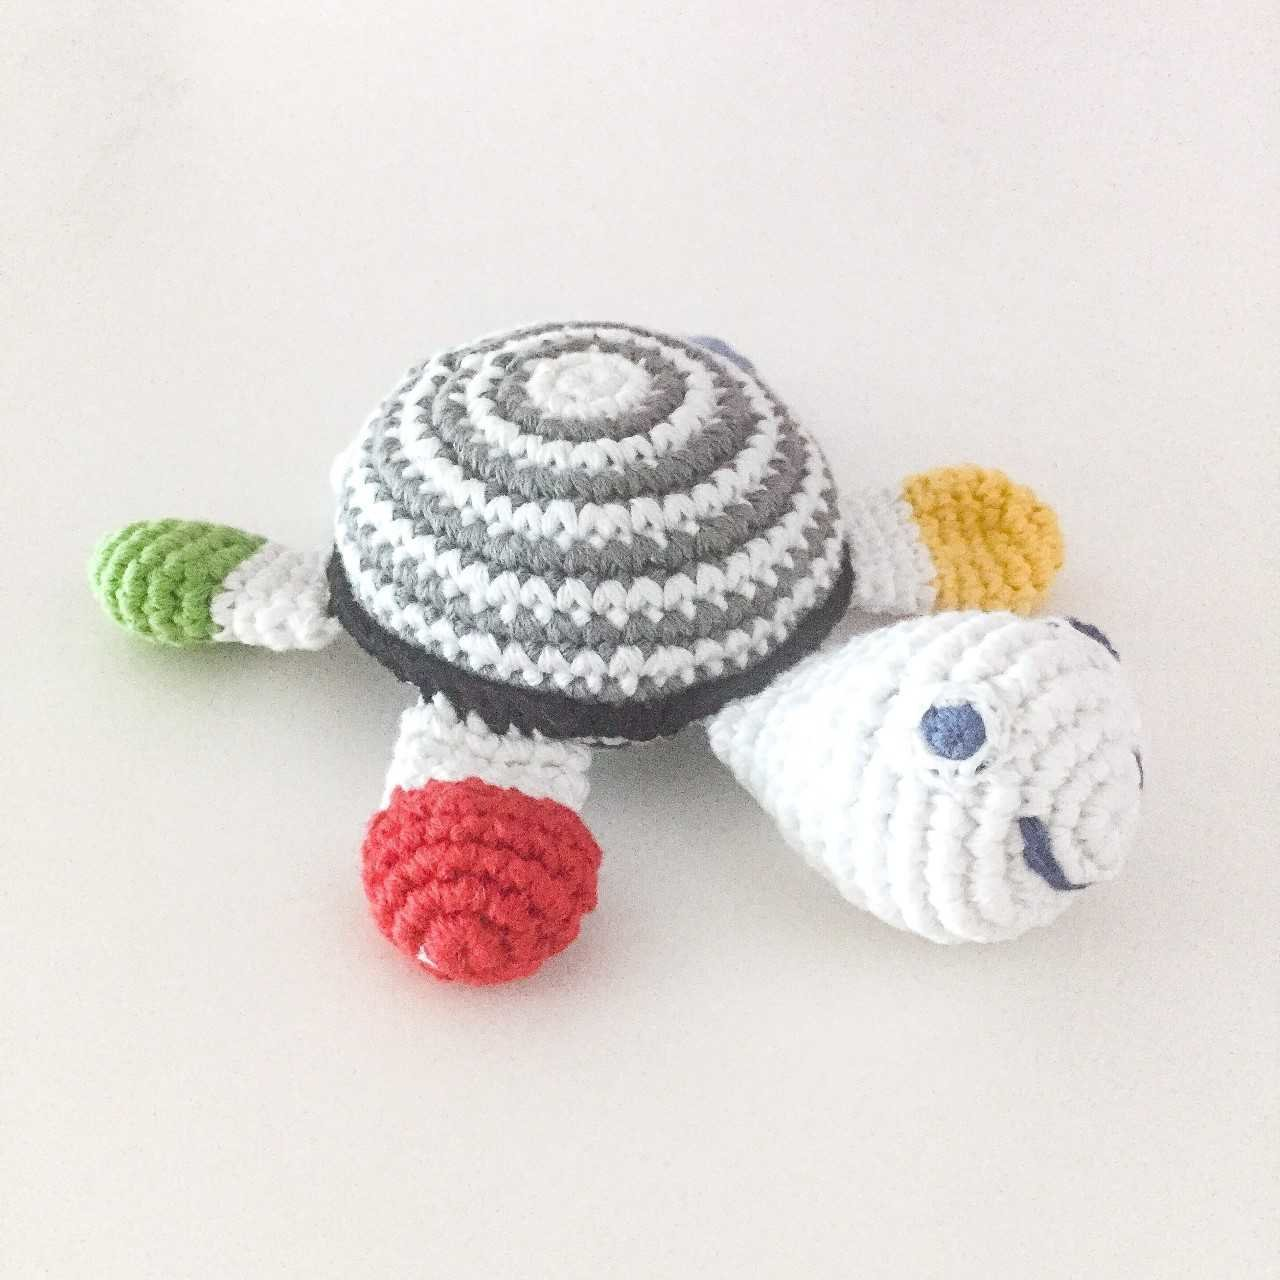 pebble-Crochet Turtle black/white